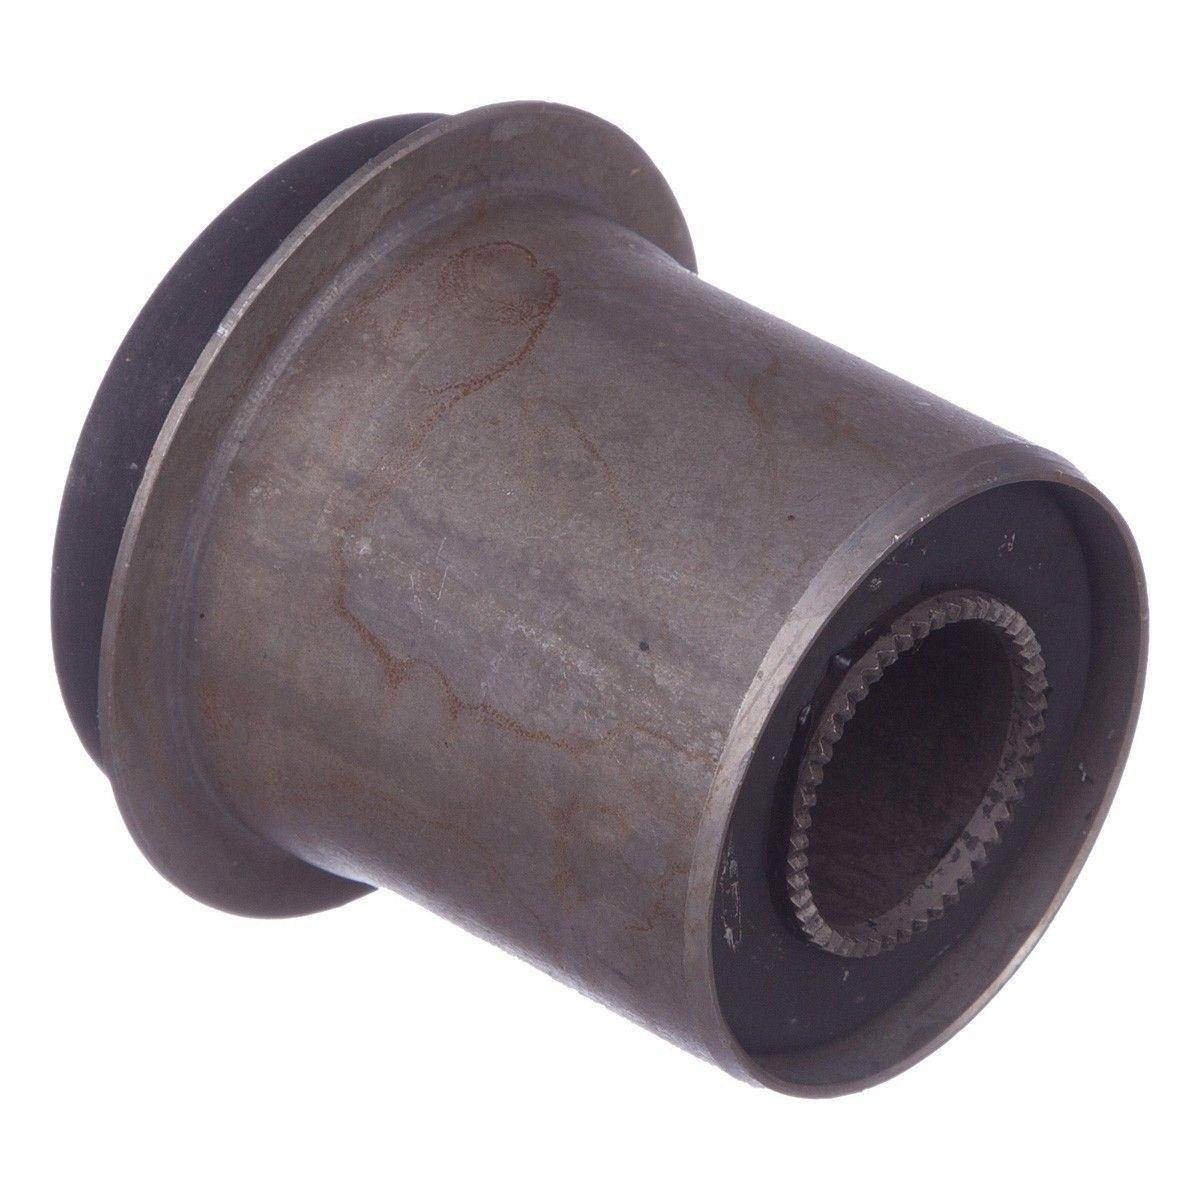 Bucha inferior bandeja dianteira - D-20 de 1985 a 1996